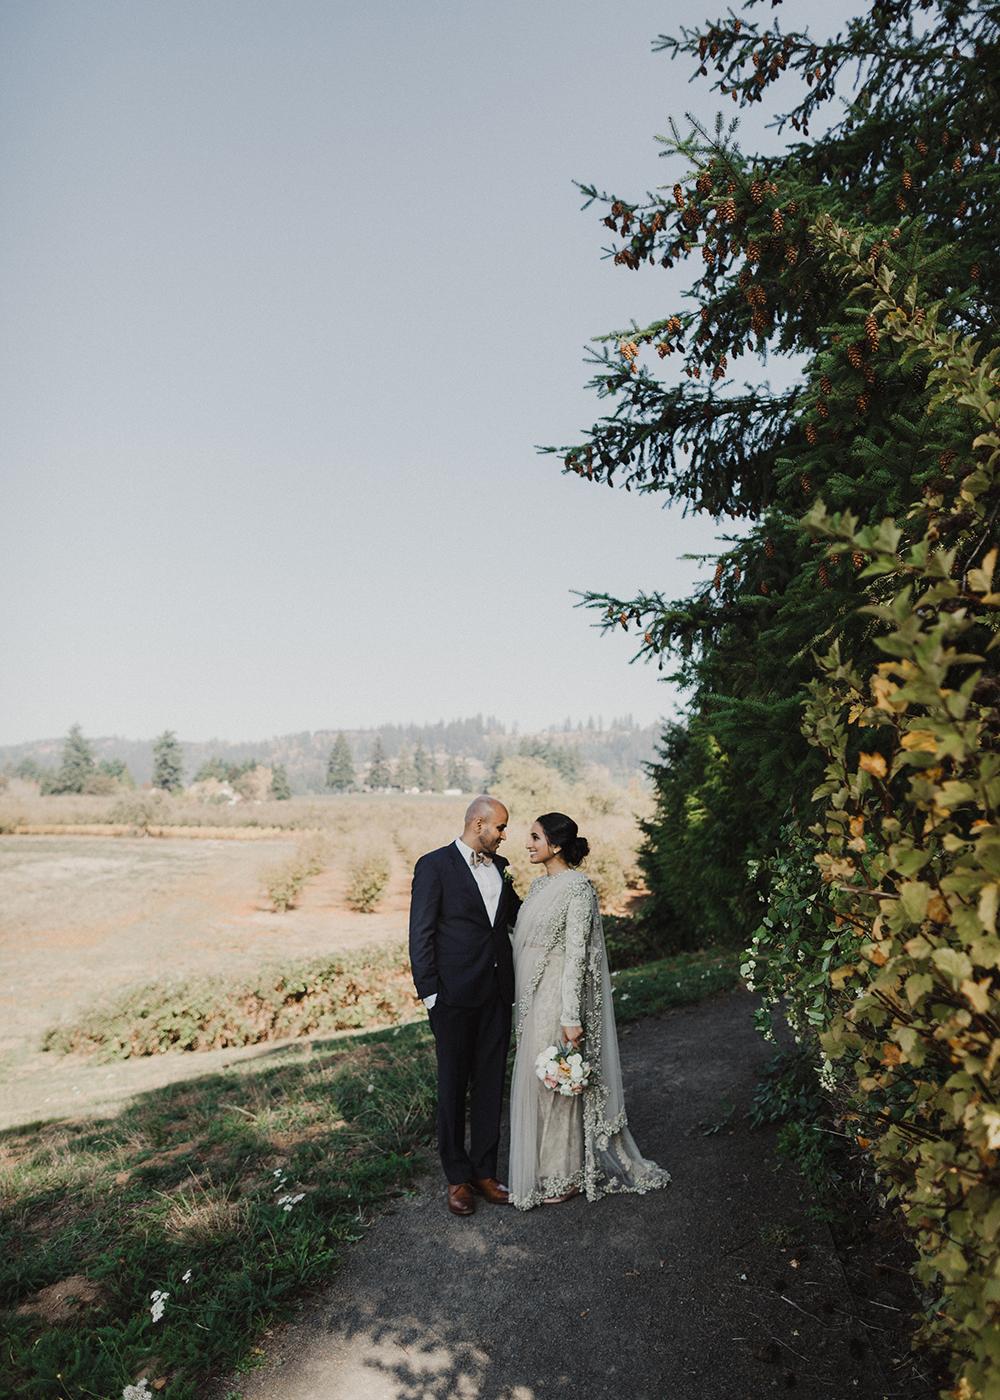 Allison Inn and Spa Wedding56.jpg